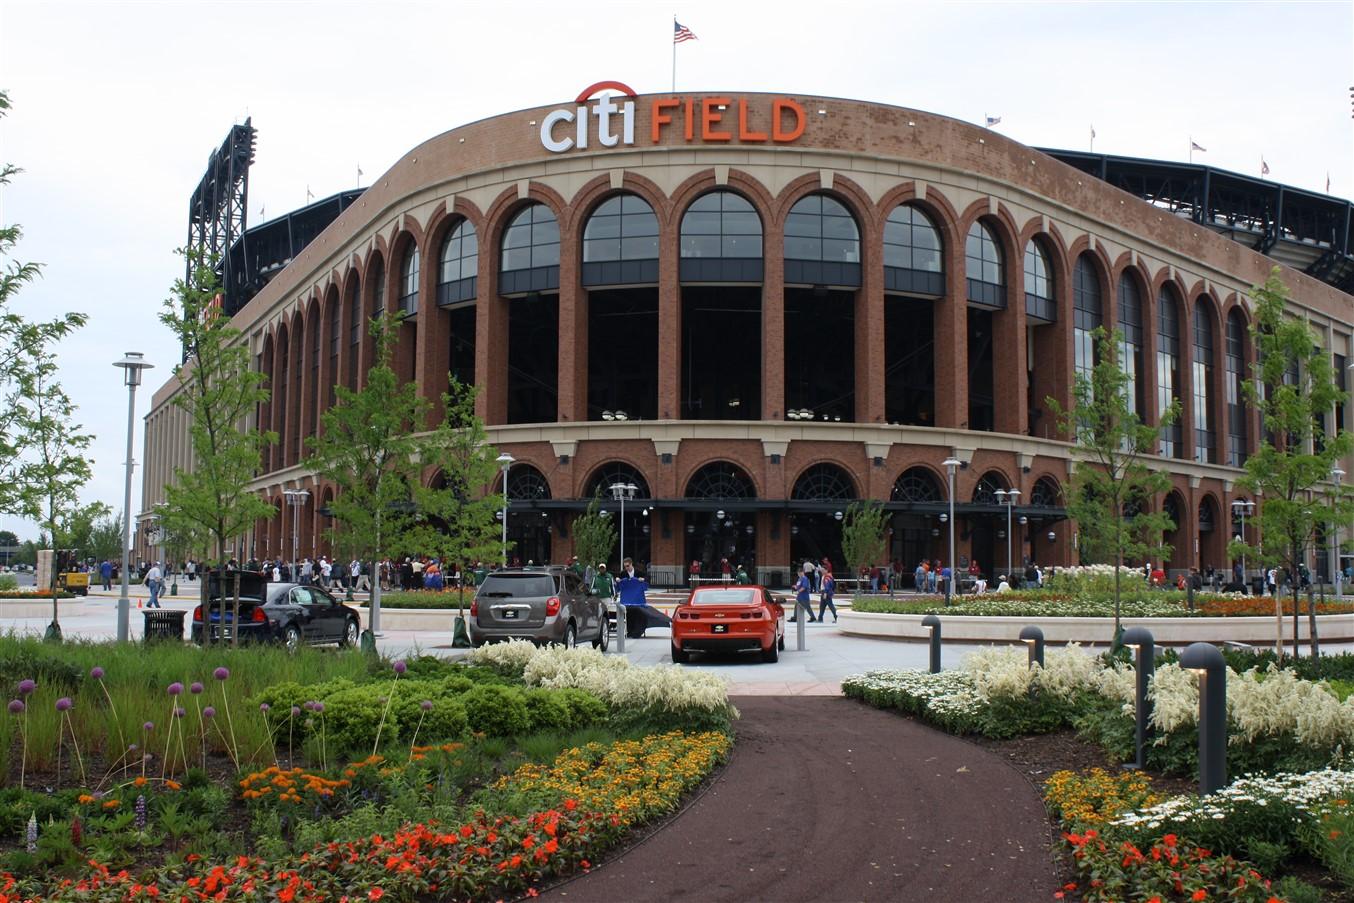 2009 06 21 Law School Road Trip Day 6 New York Mets 33.jpg